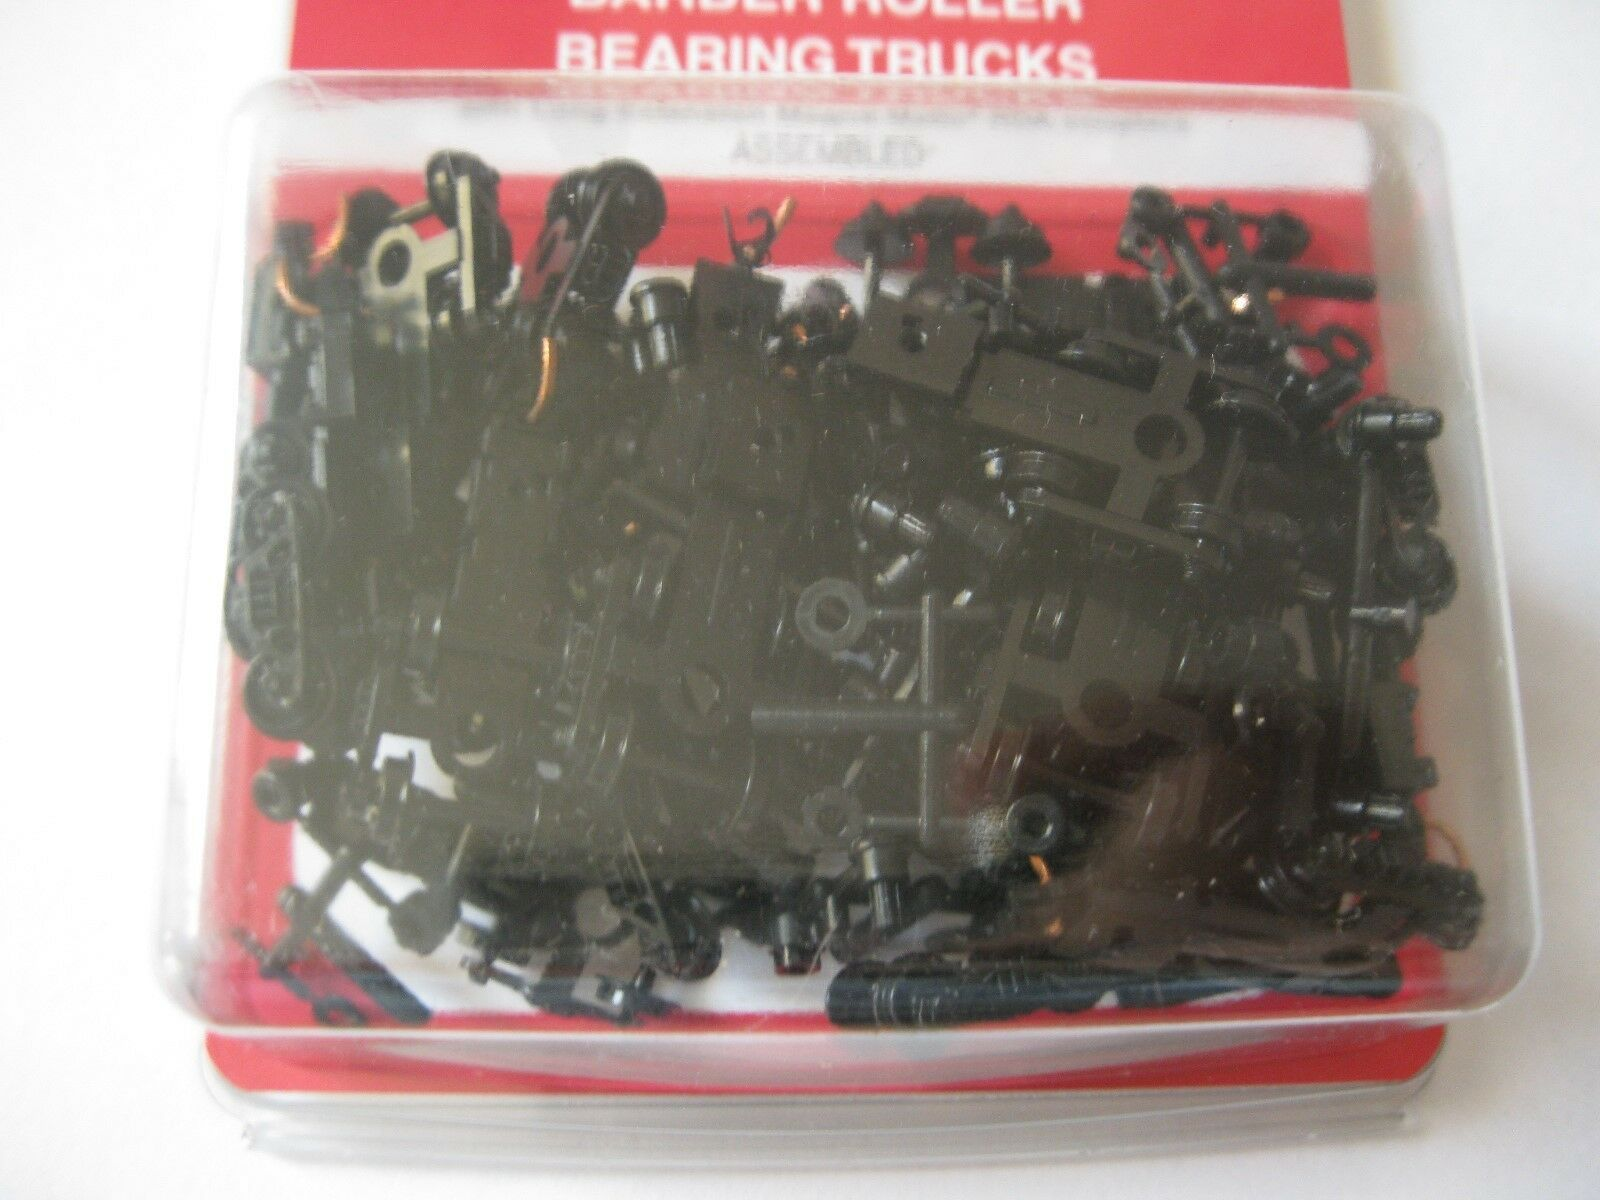 Micro-Trains Stock #00310044  (1038-10) Roller Bearing Trucks Long Couplers